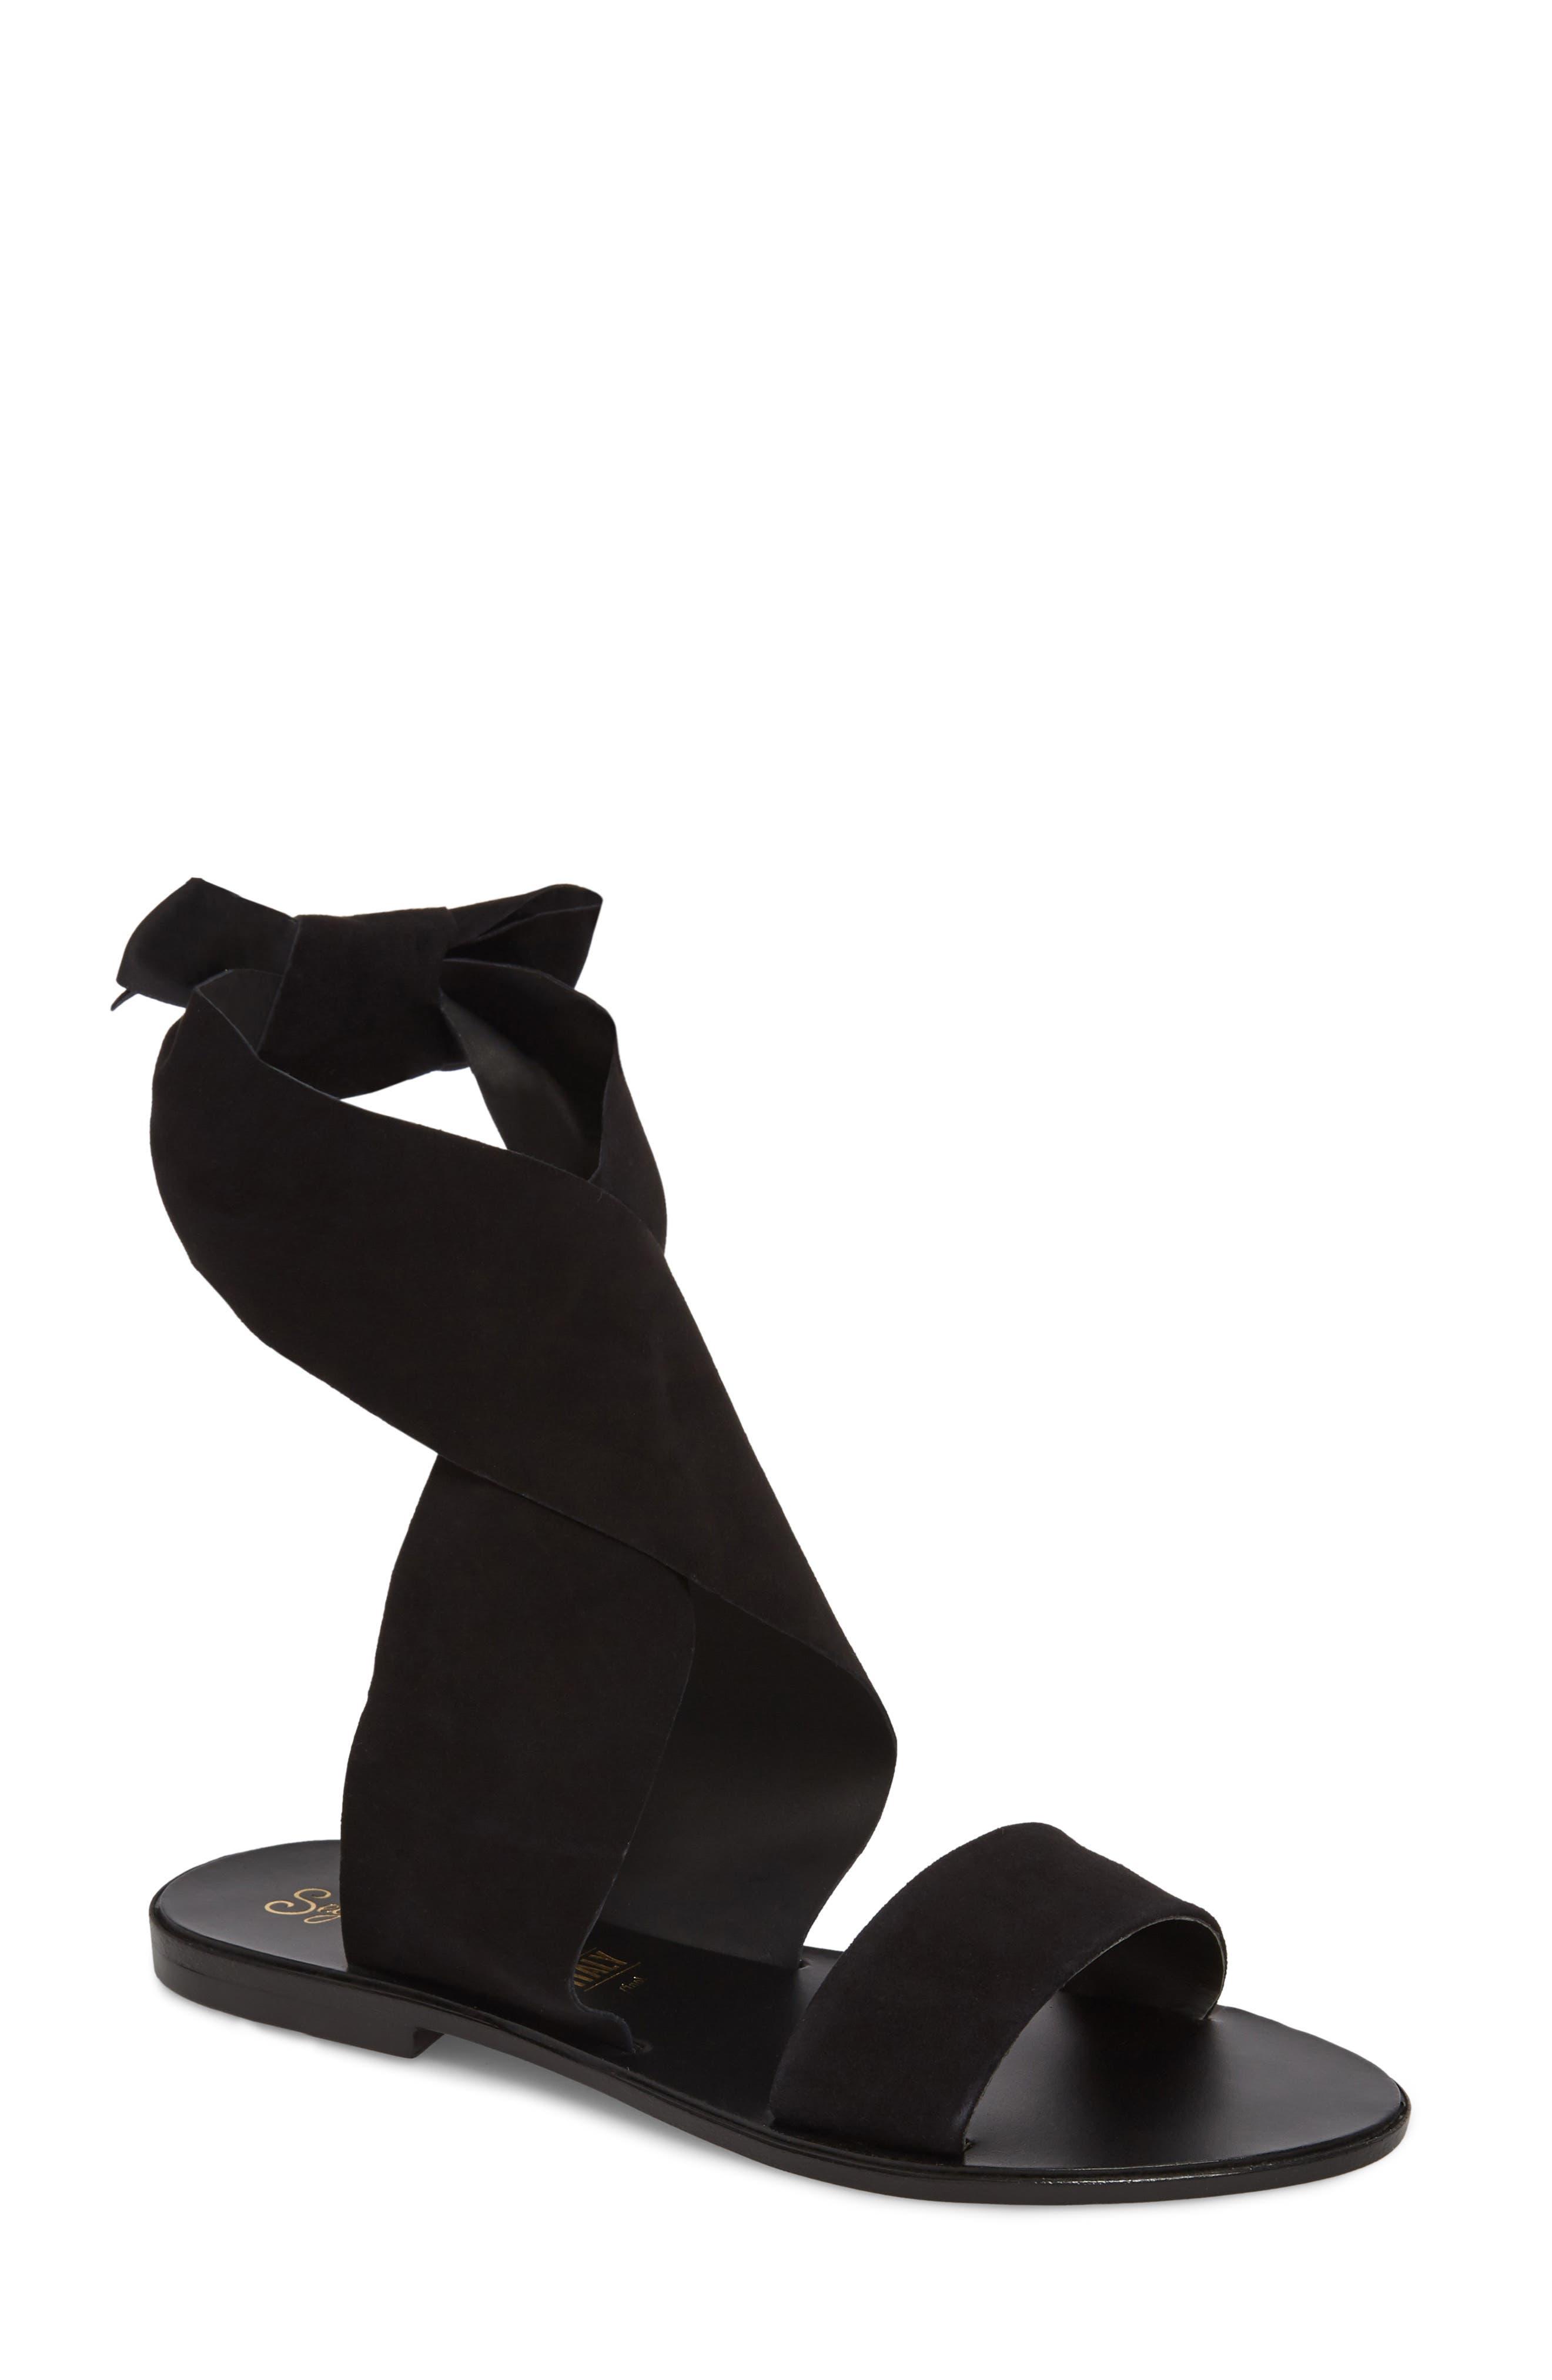 Cruisin Ankle Wrap Sandal,                             Main thumbnail 1, color,                             001